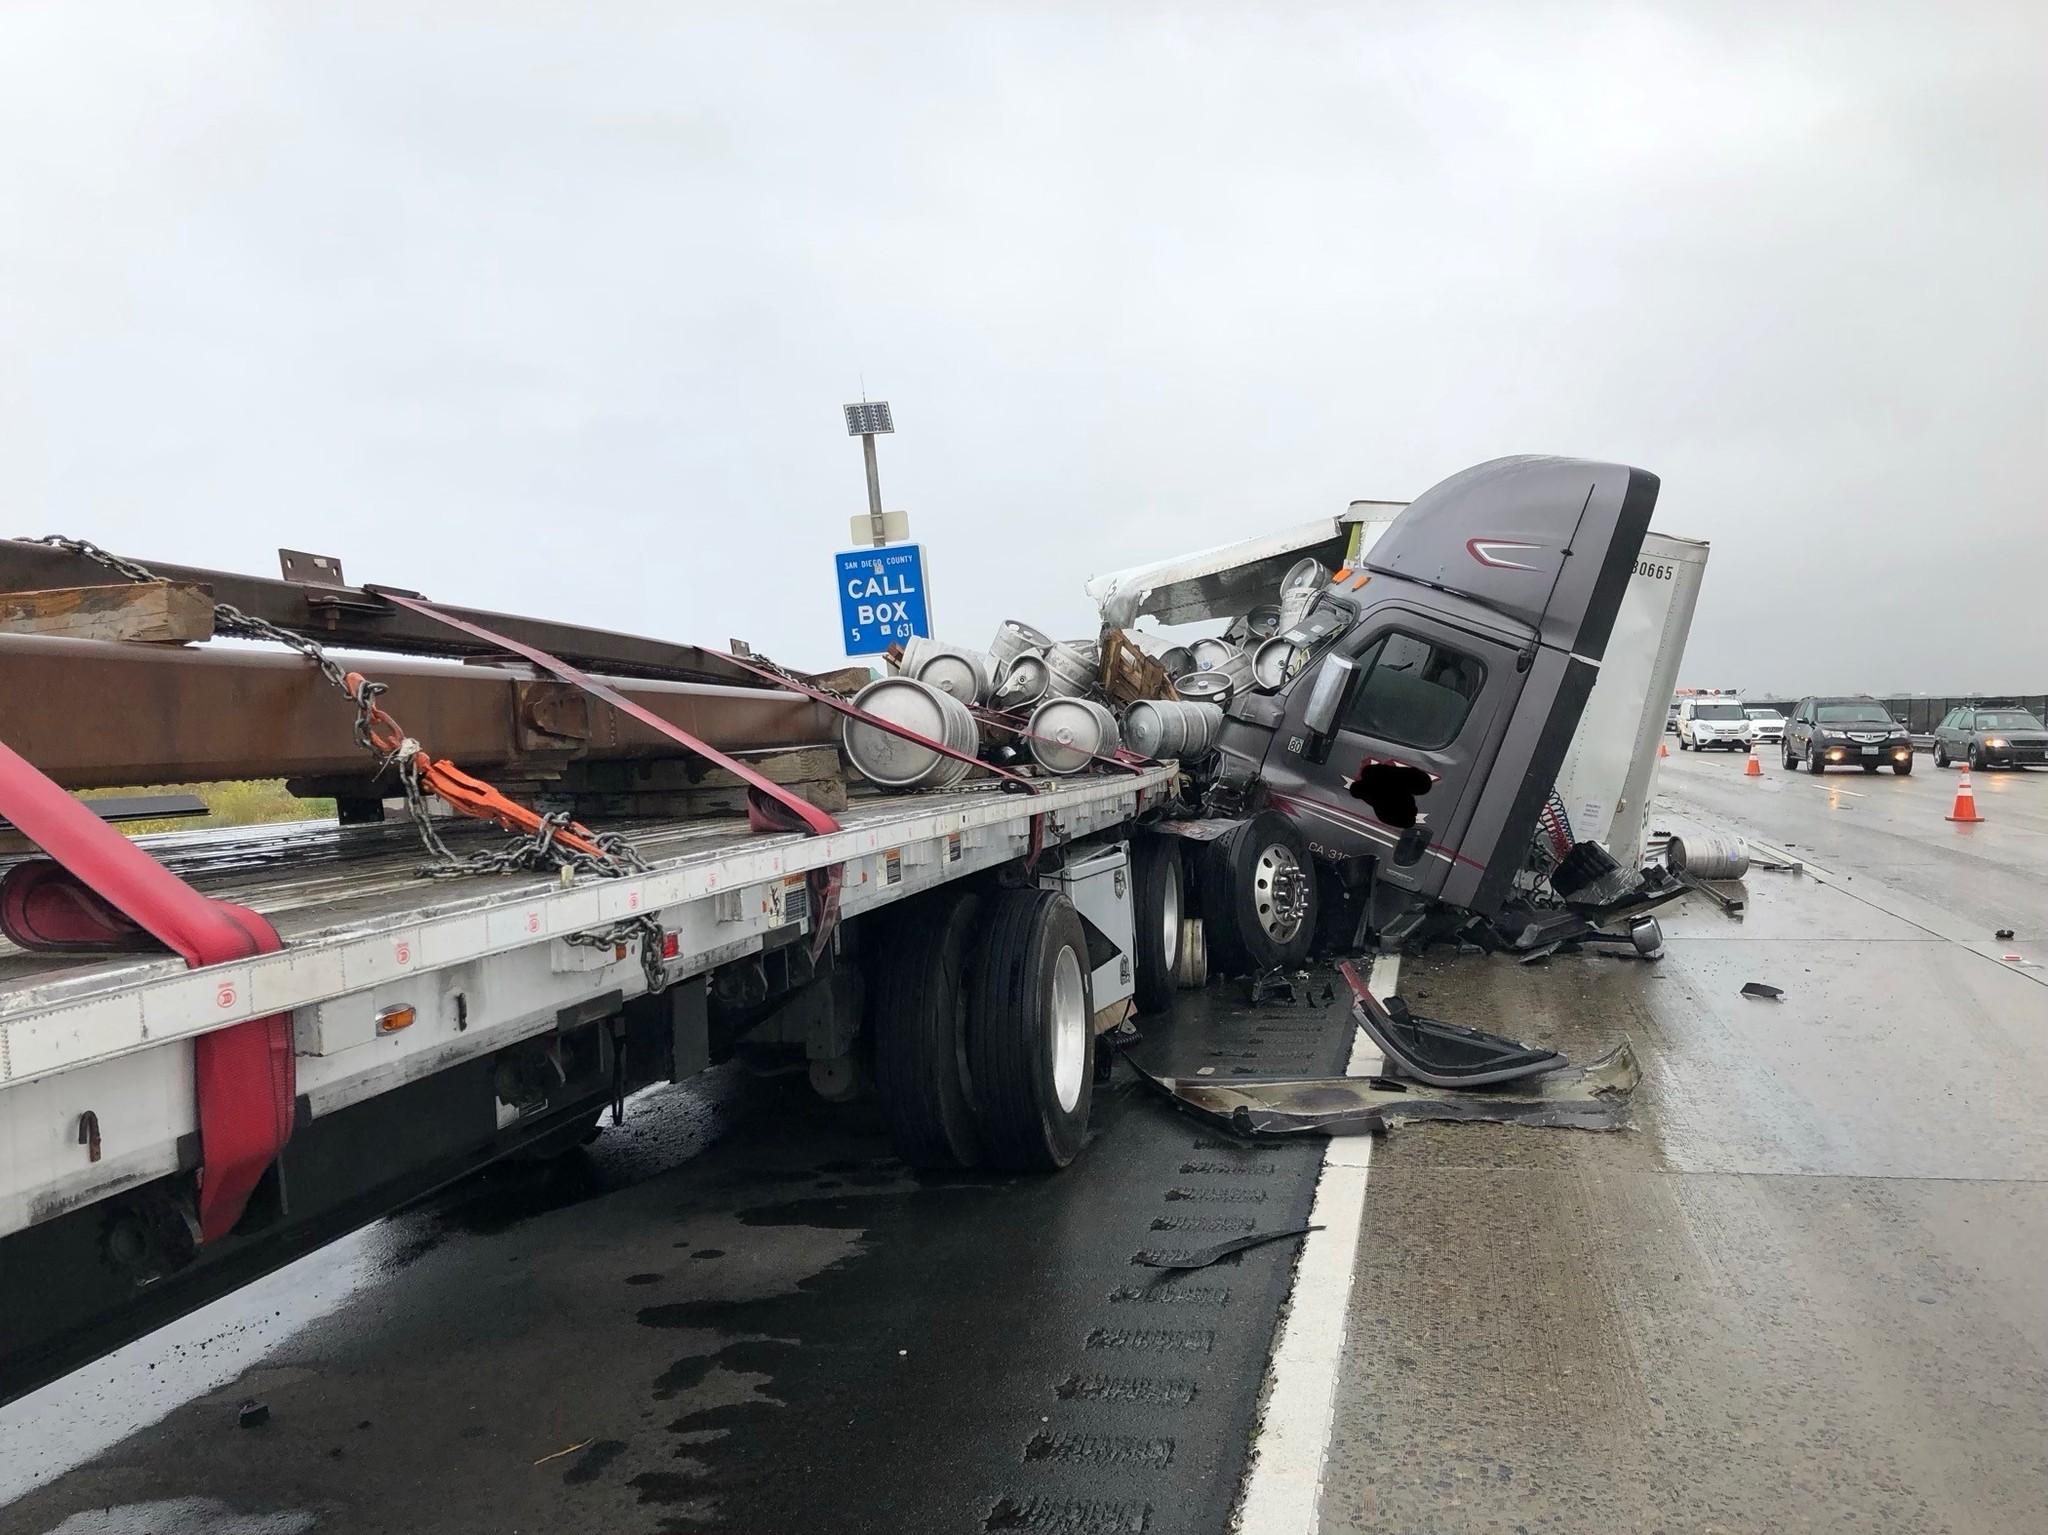 Traffic slow on south I-5 near Orange County line as lanes